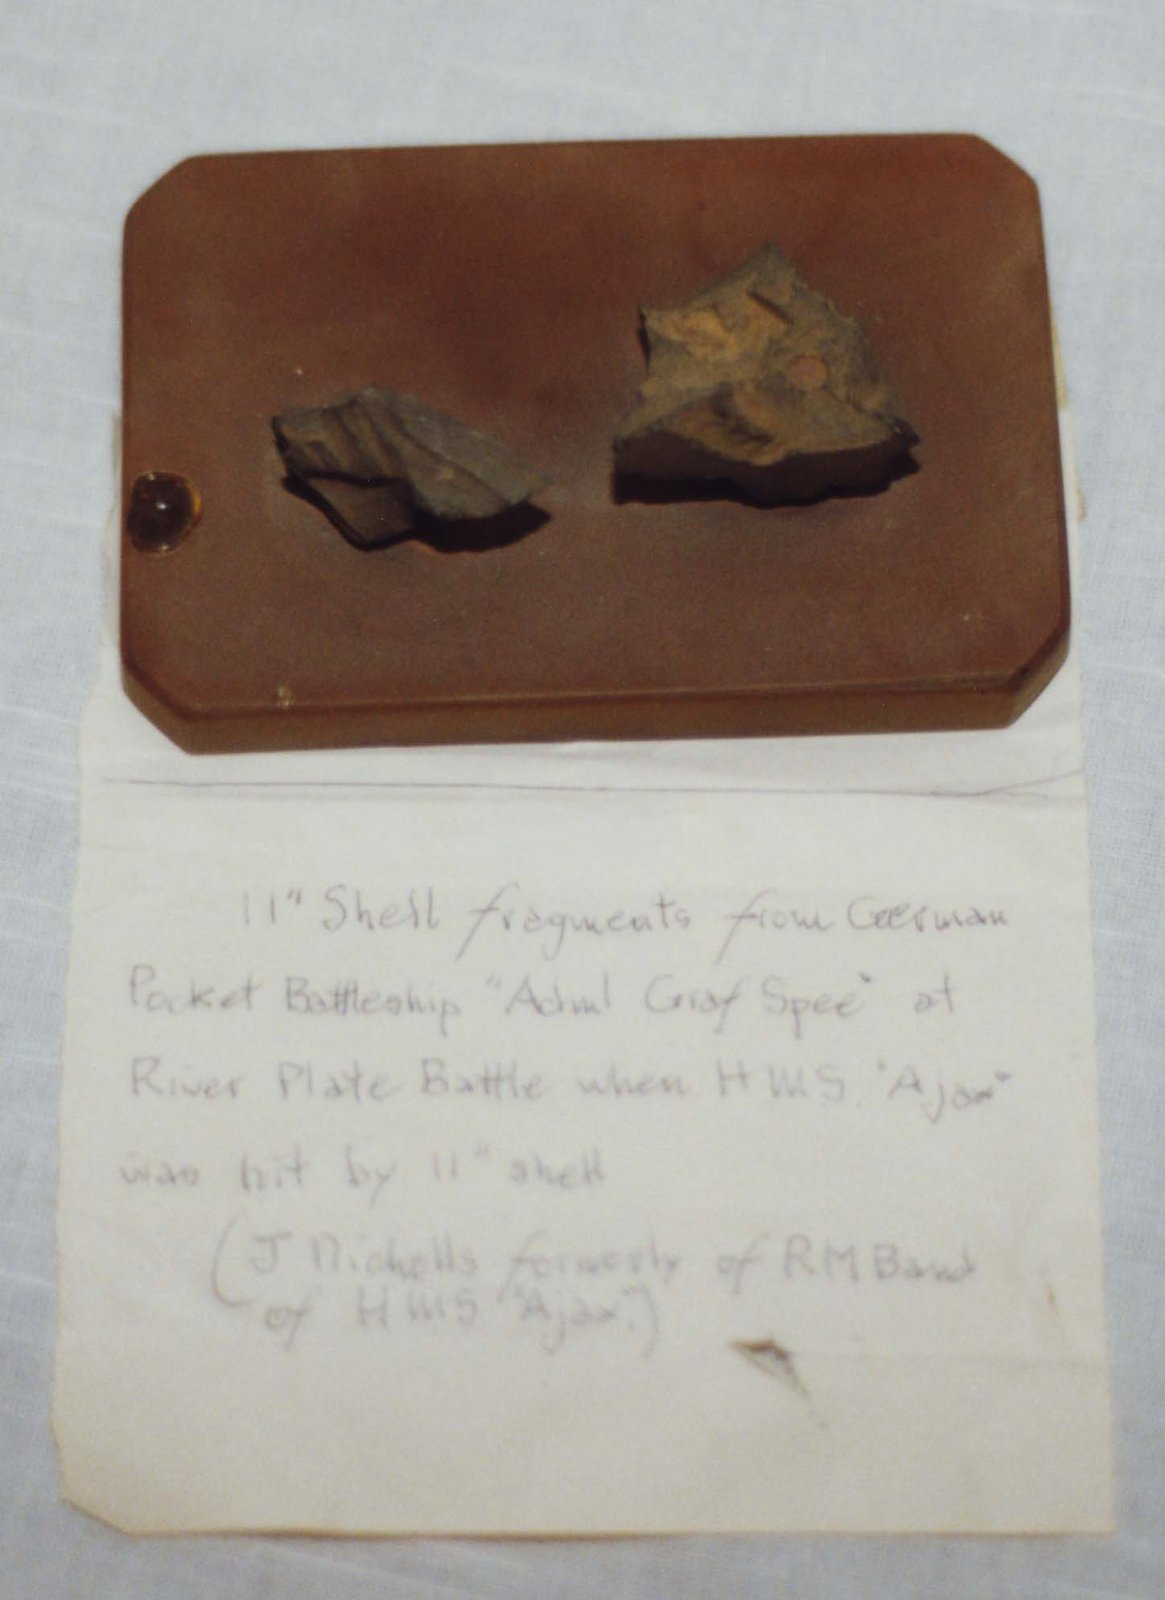 Shell Fragments